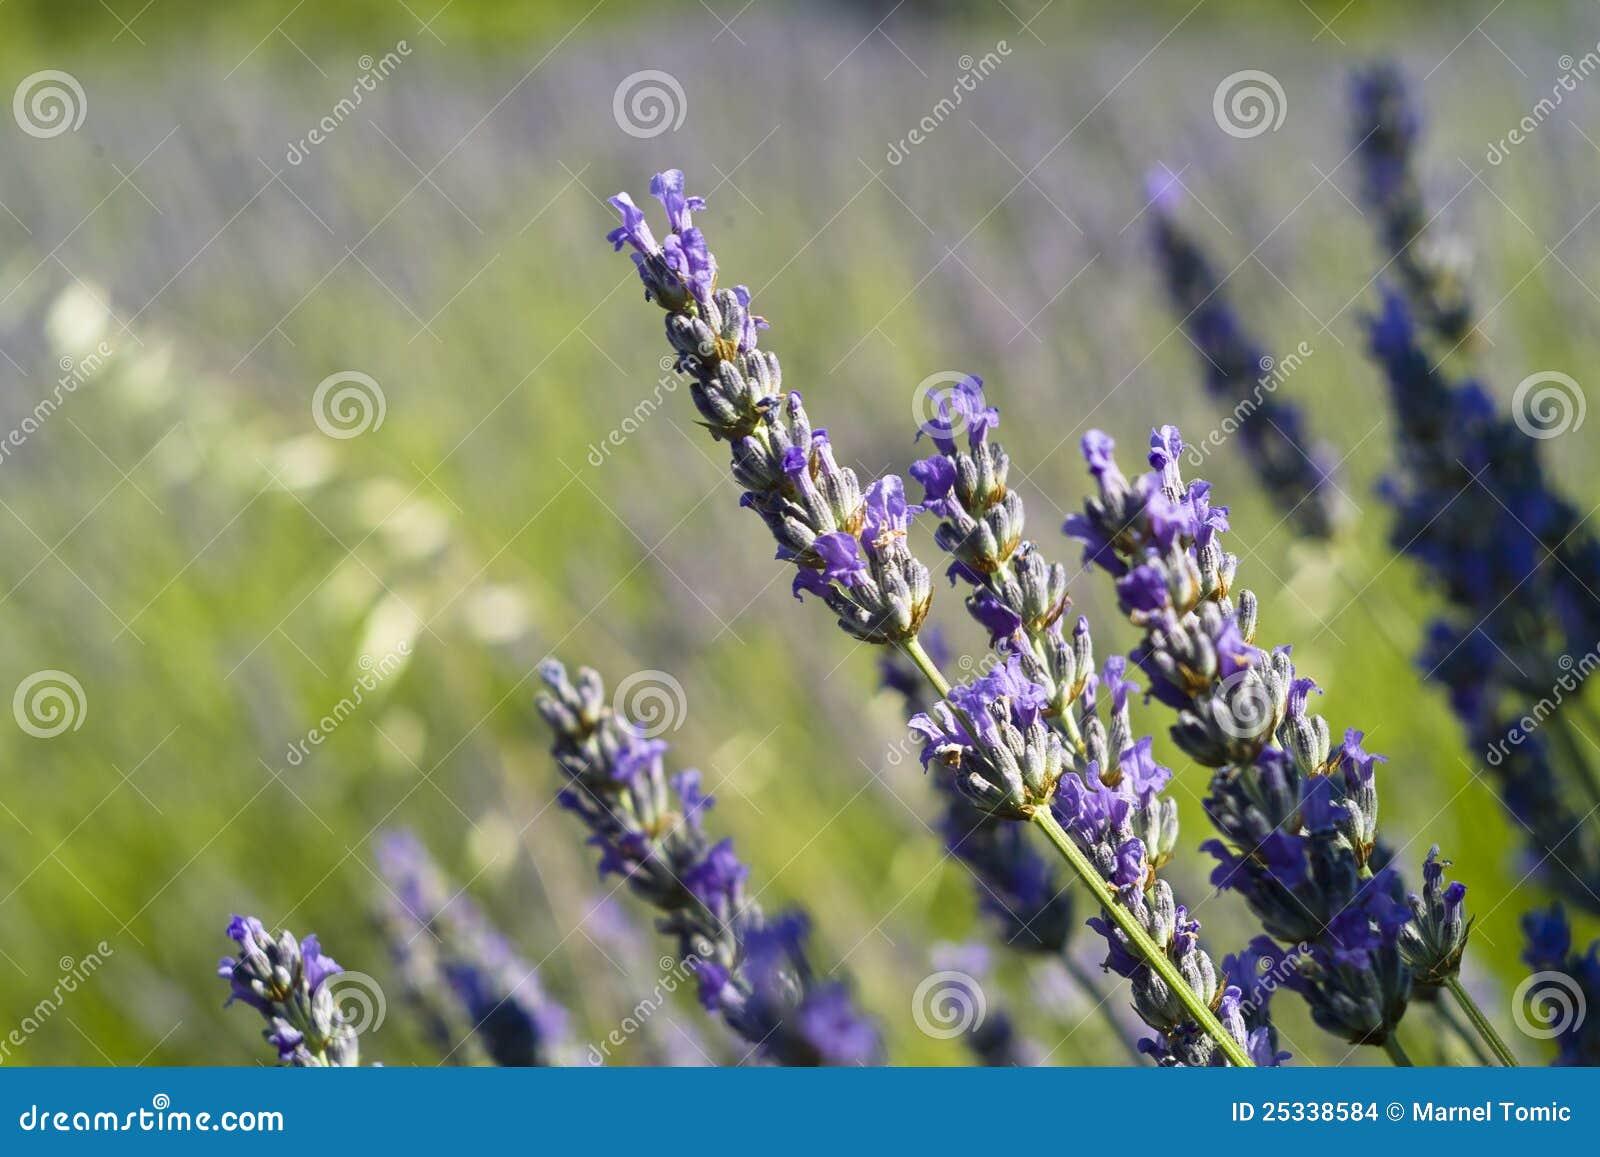 The lavender (Lavandula) flower closeup